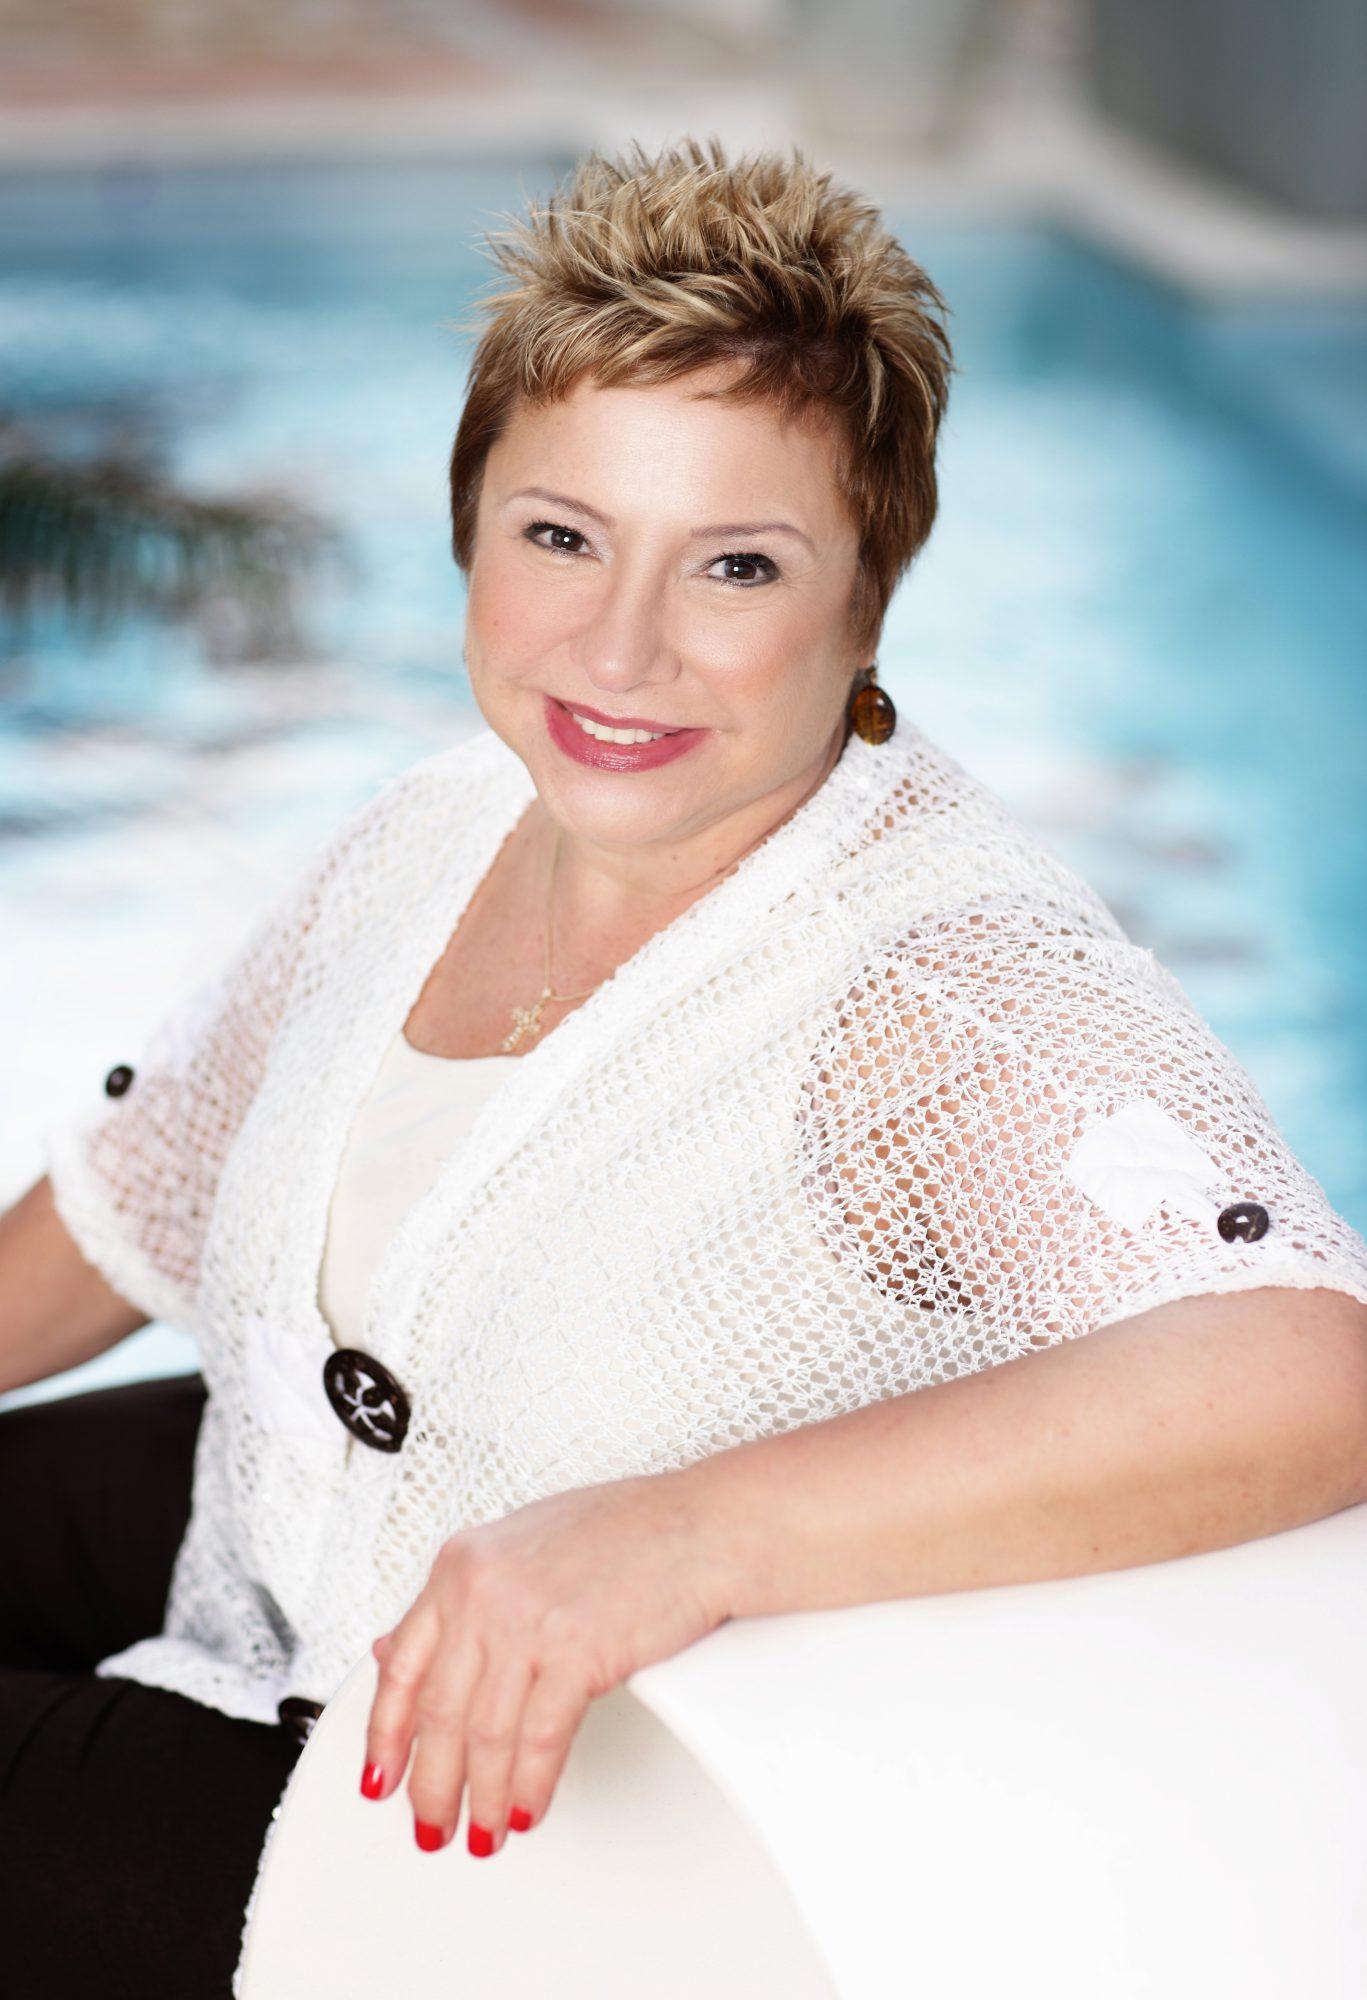 Angie Benitez - ahijada de Adamari Lopez